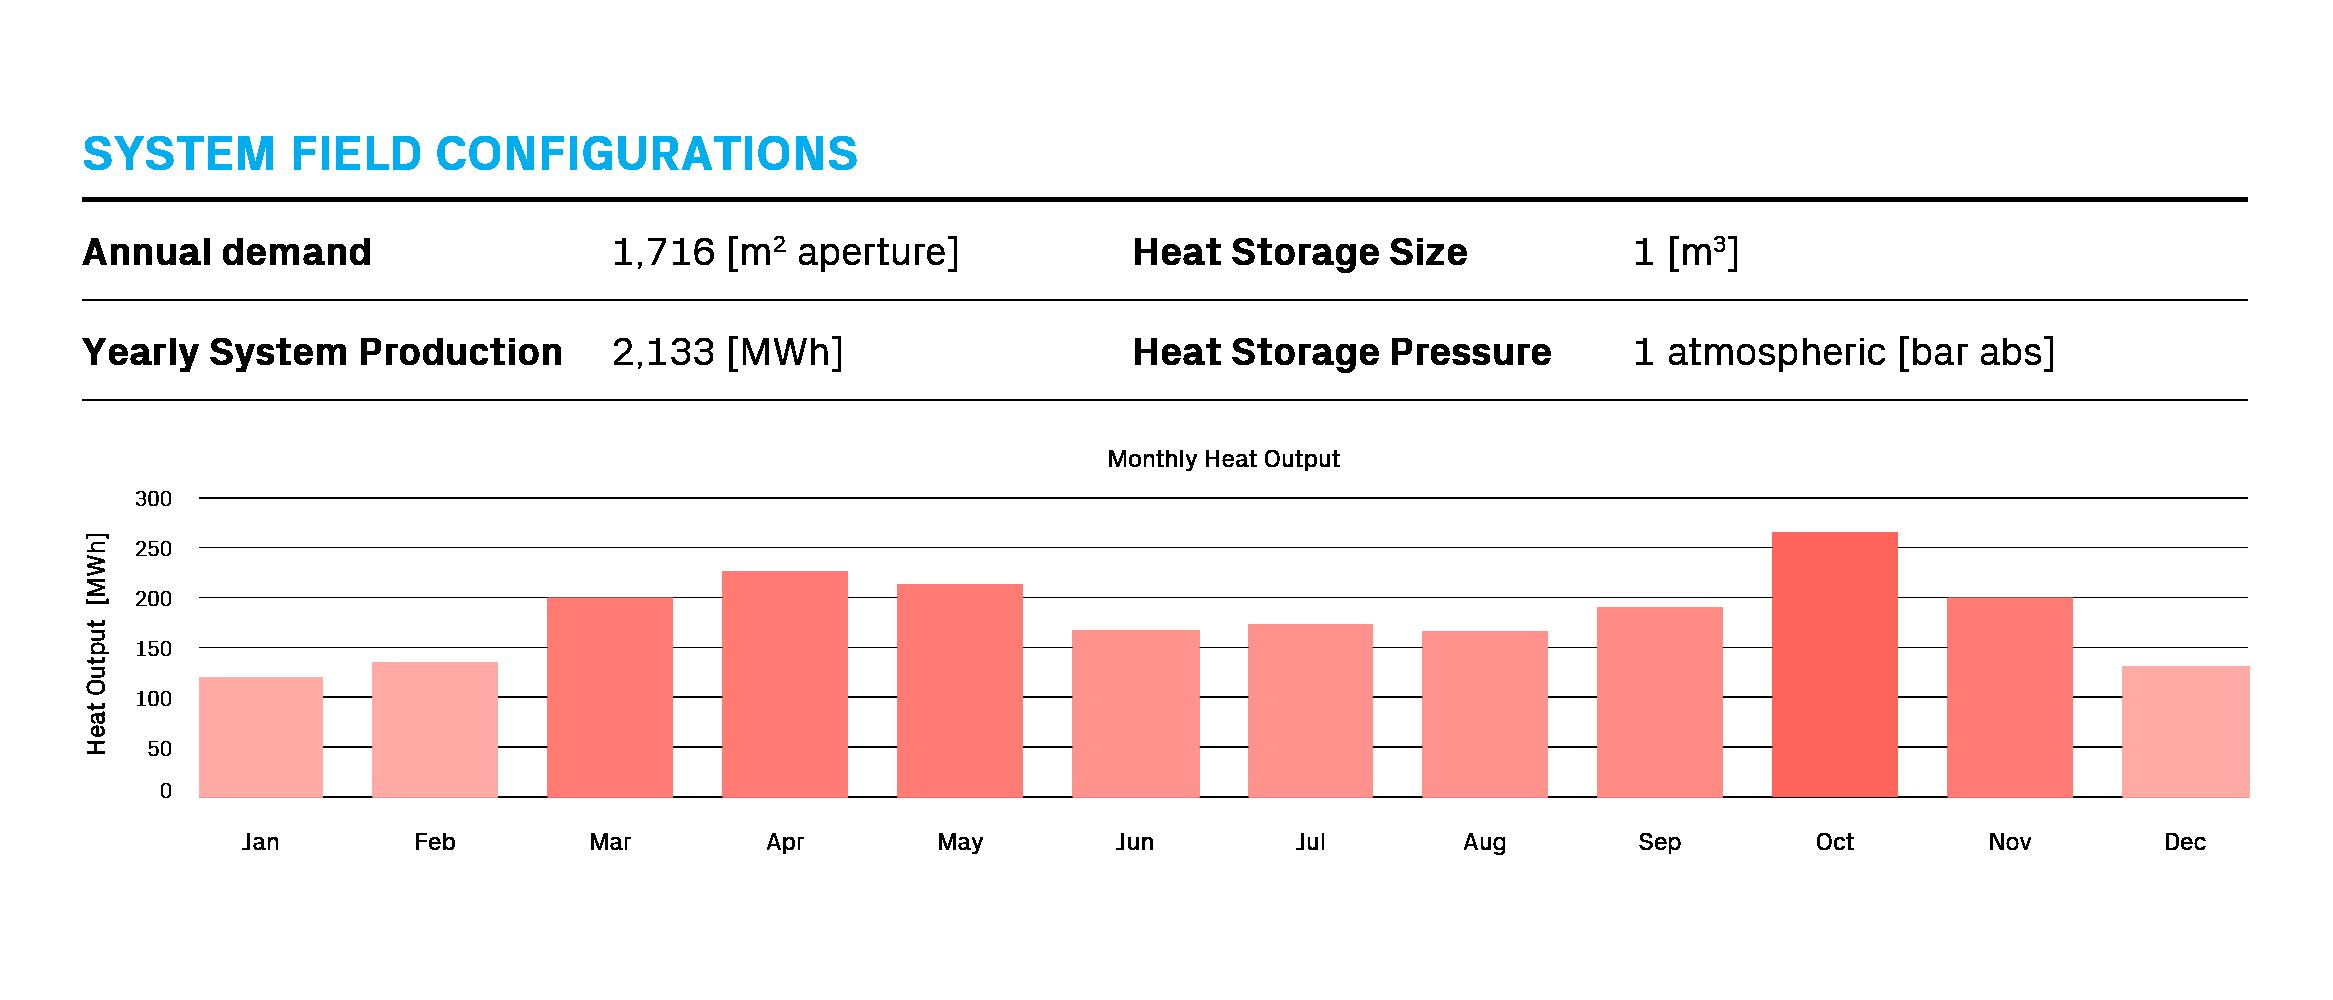 System-Field-Configuration-desalination